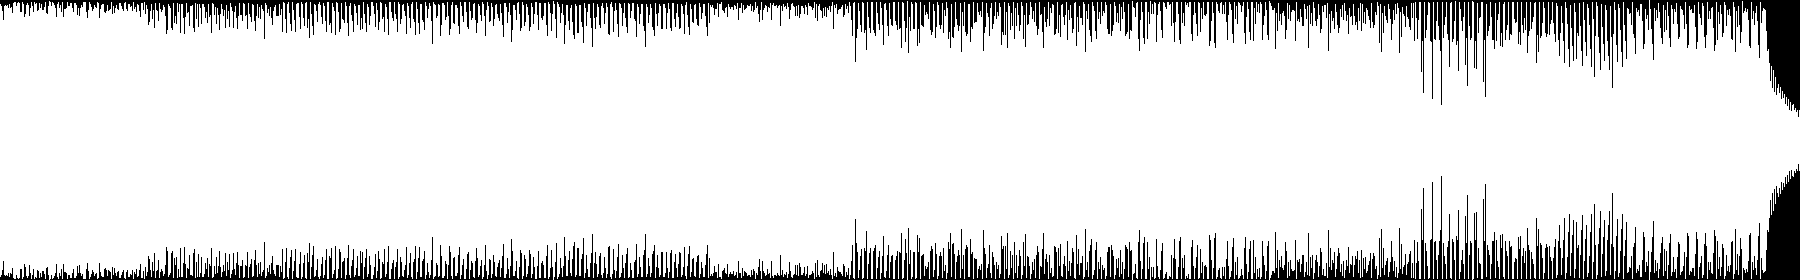 TR-8 / TB-3 Samples audio waveform